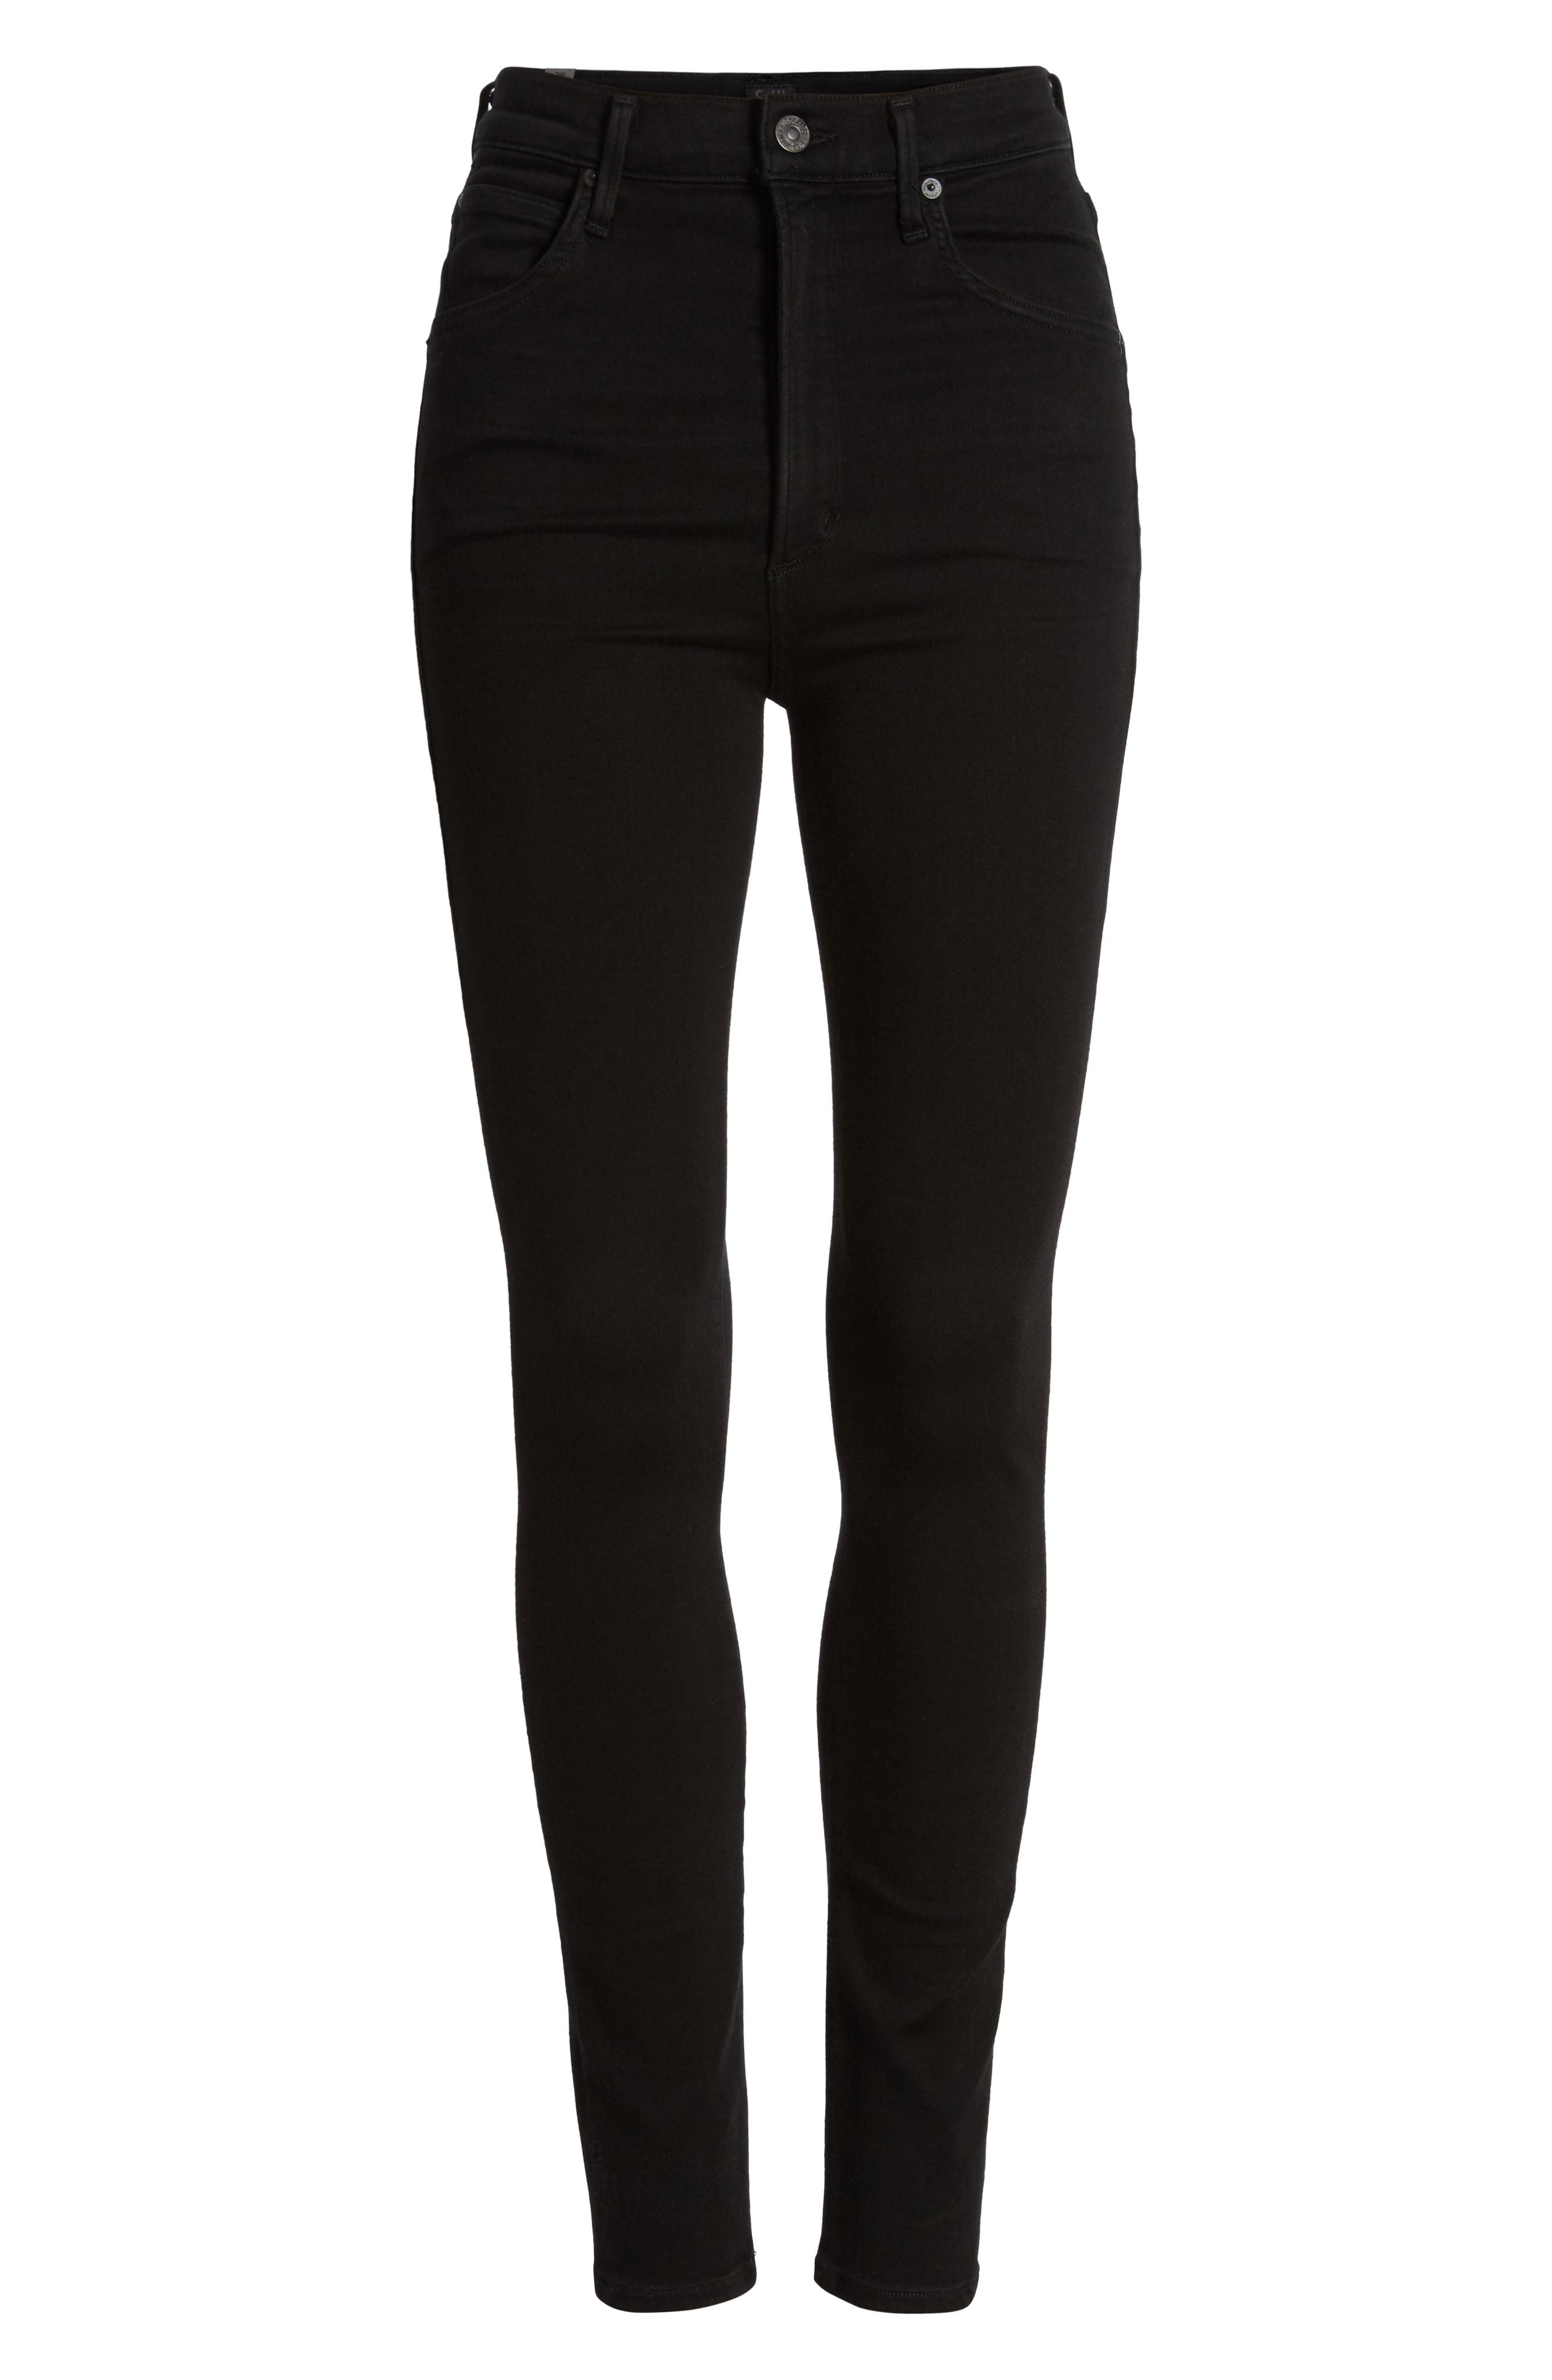 Chrissy High Waist Skinny Jeans,                             Alternate thumbnail 7, color,                             ALL BLACK